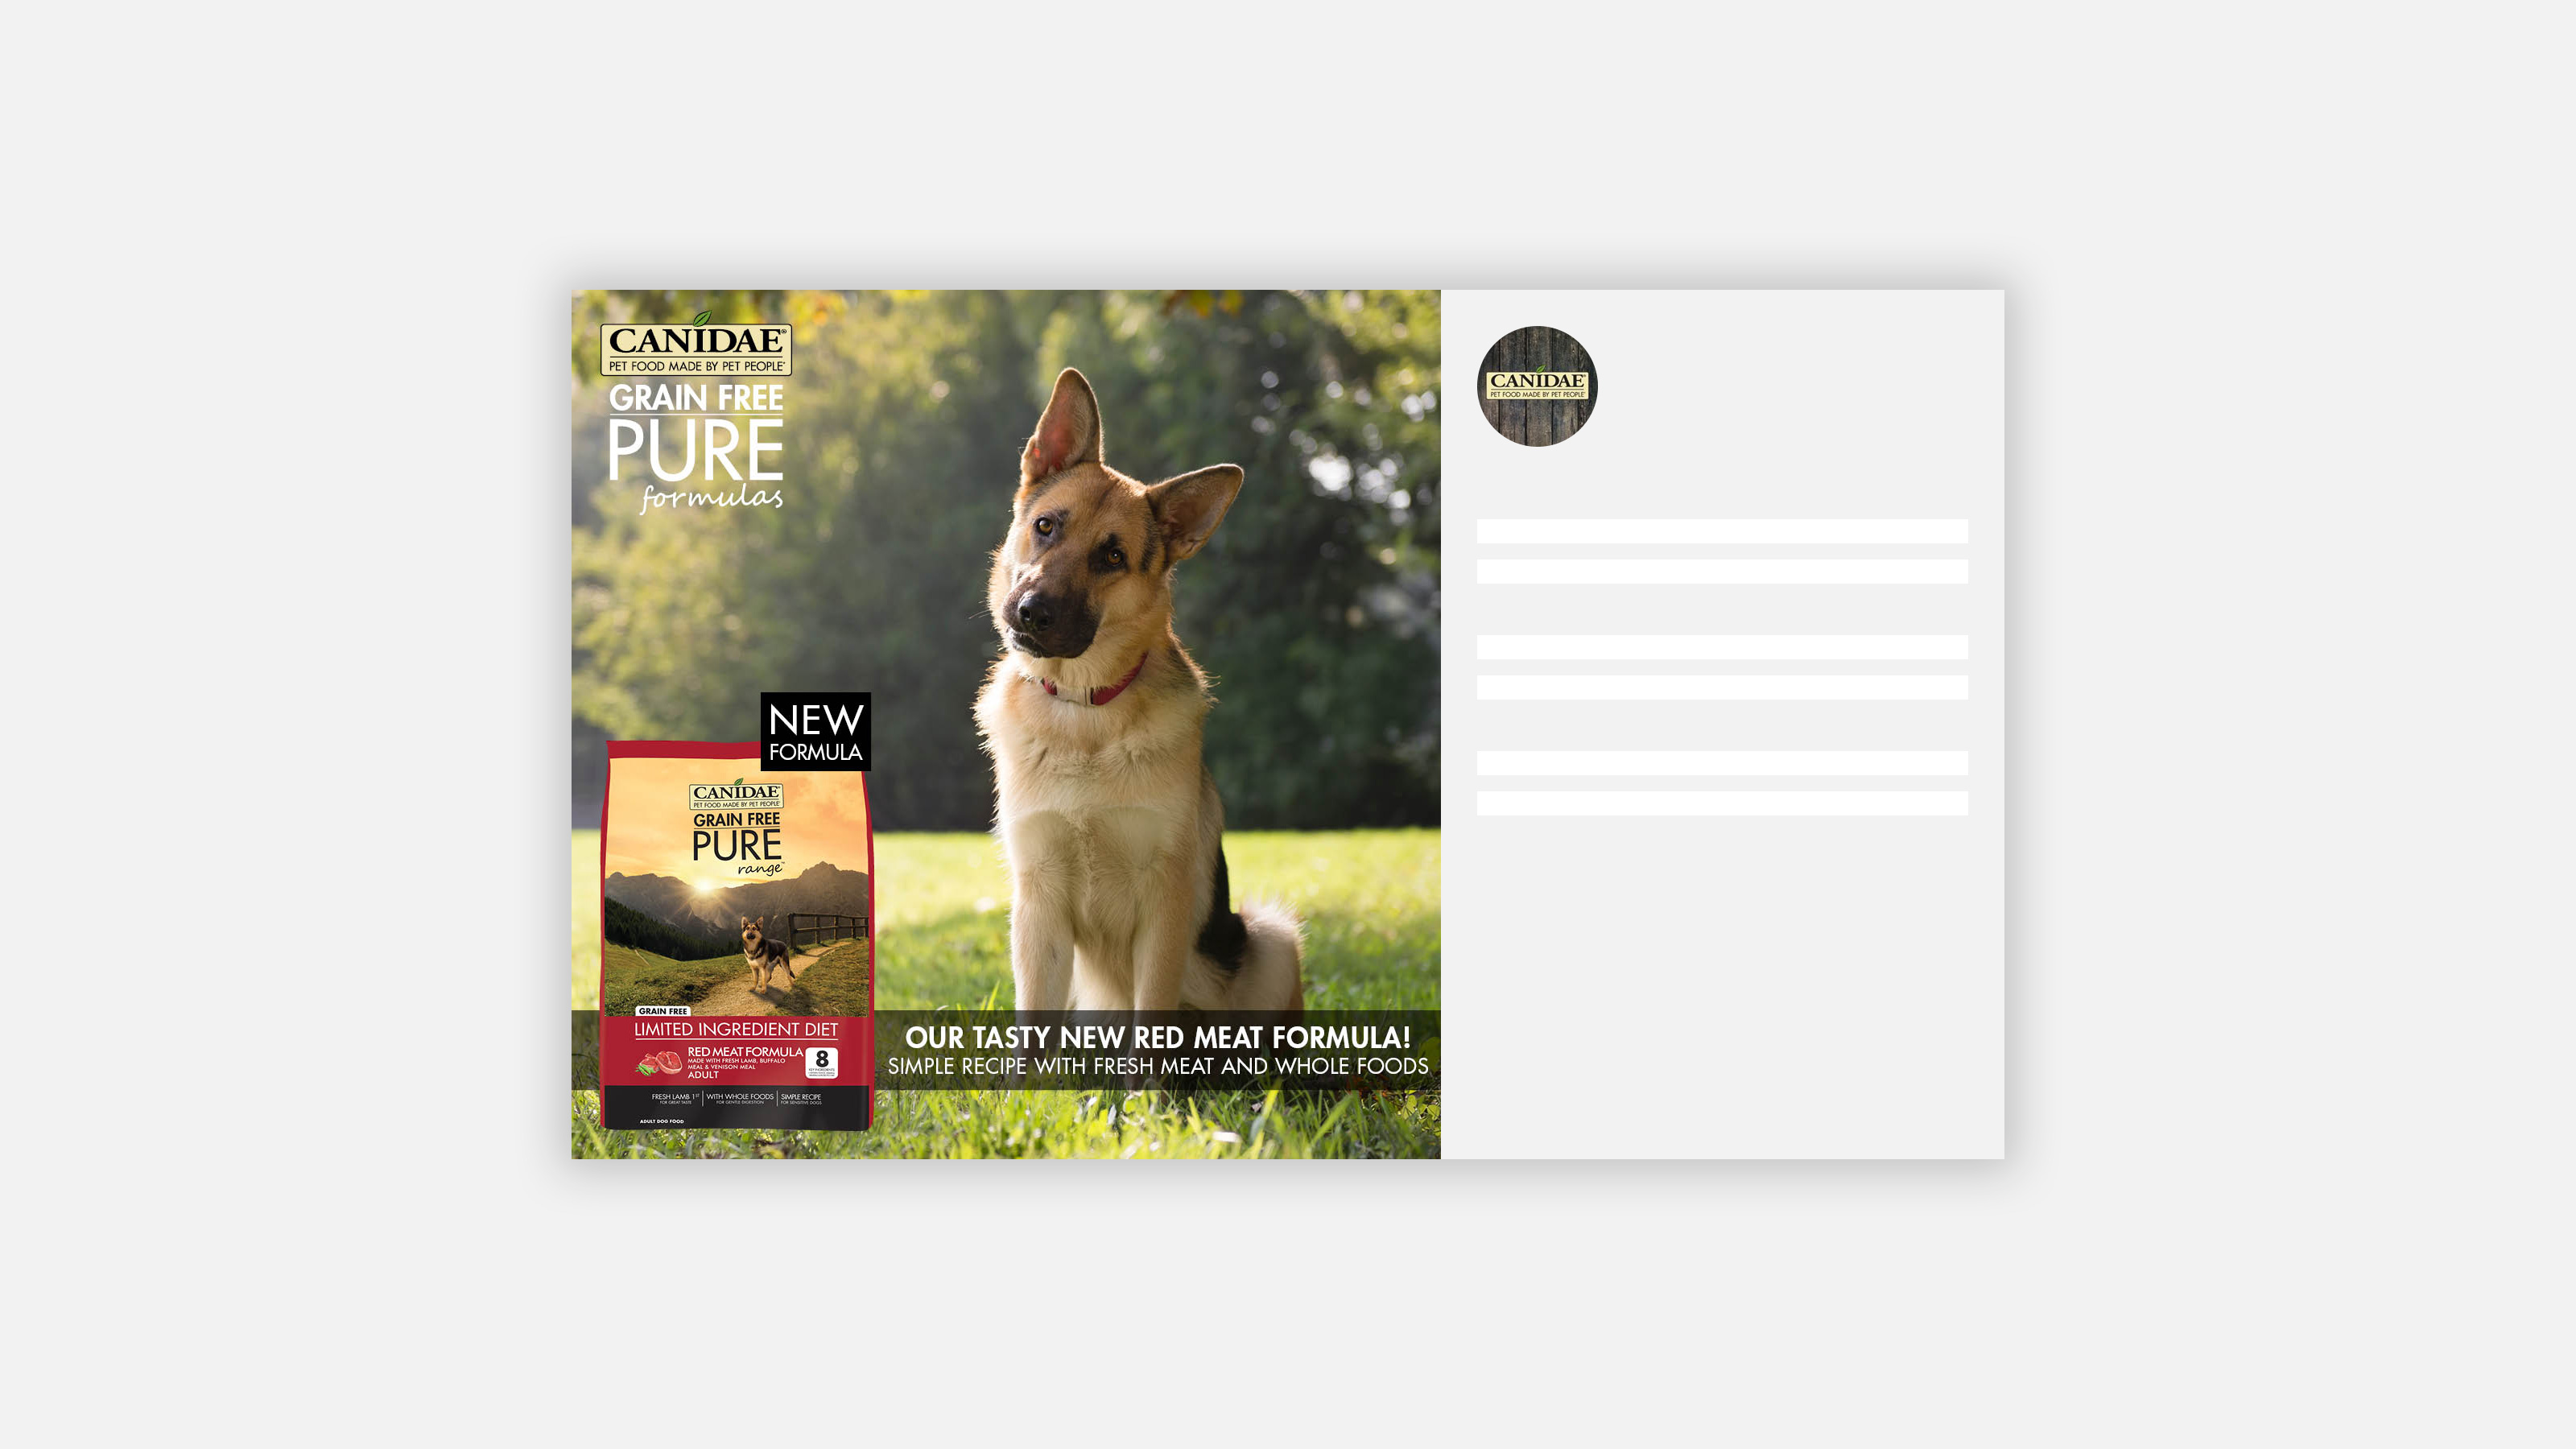 CANIDAE Pet Food Instagram image